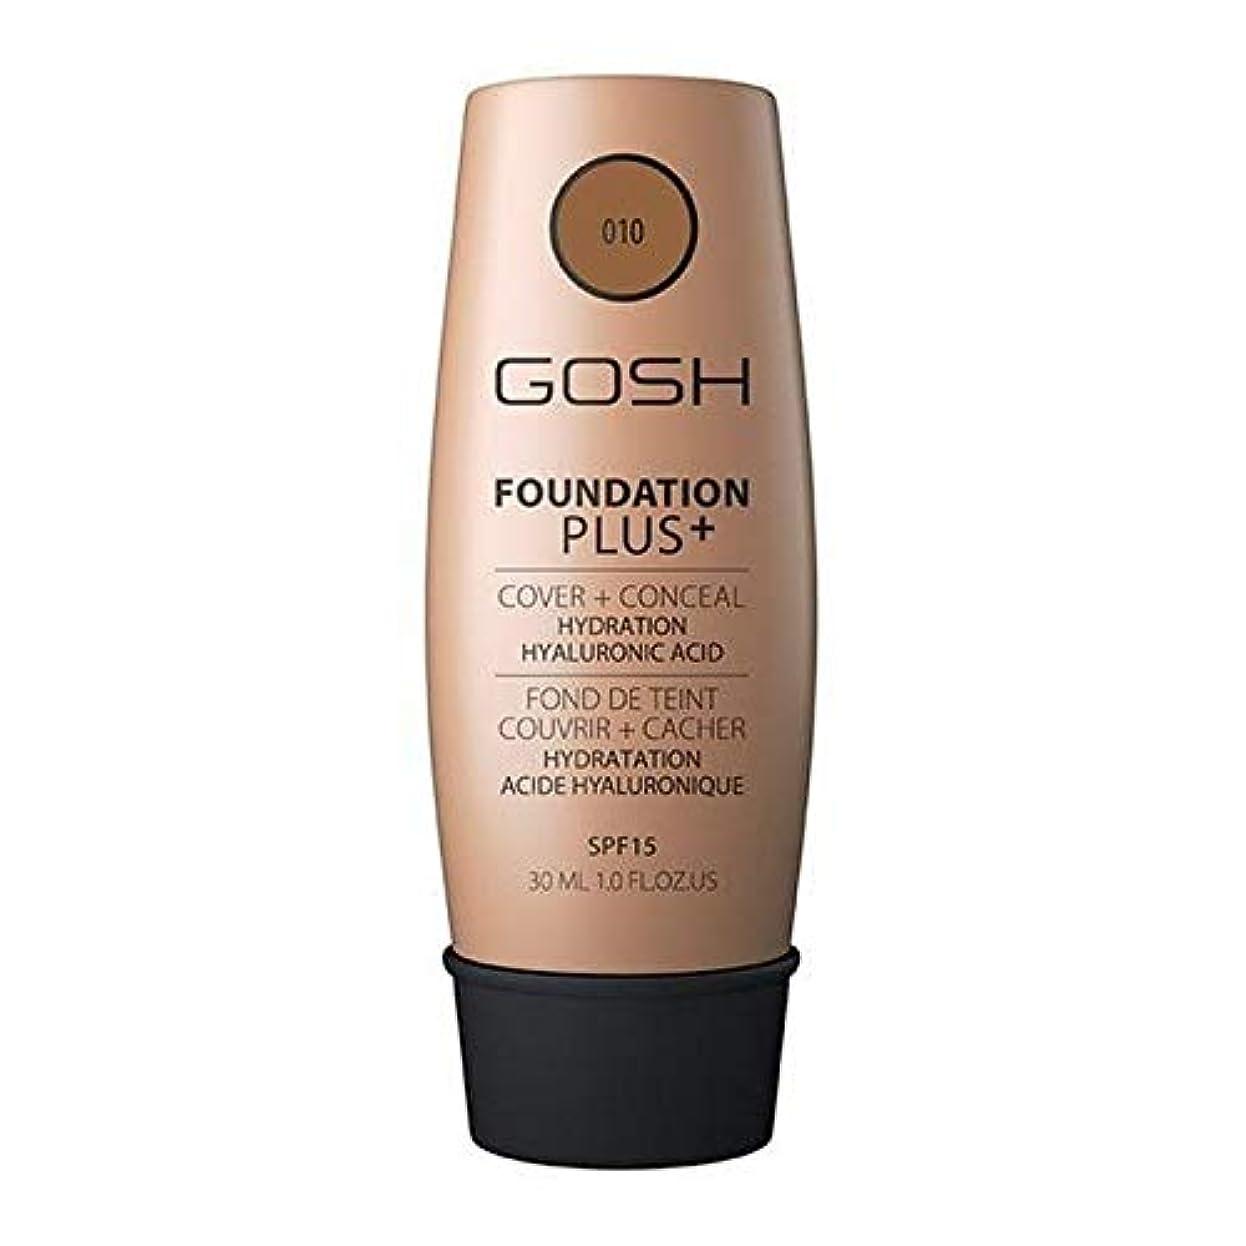 [GOSH ] おやっ基盤プラス+日焼け010 - Gosh Foundation Plus+ Tan 010 [並行輸入品]